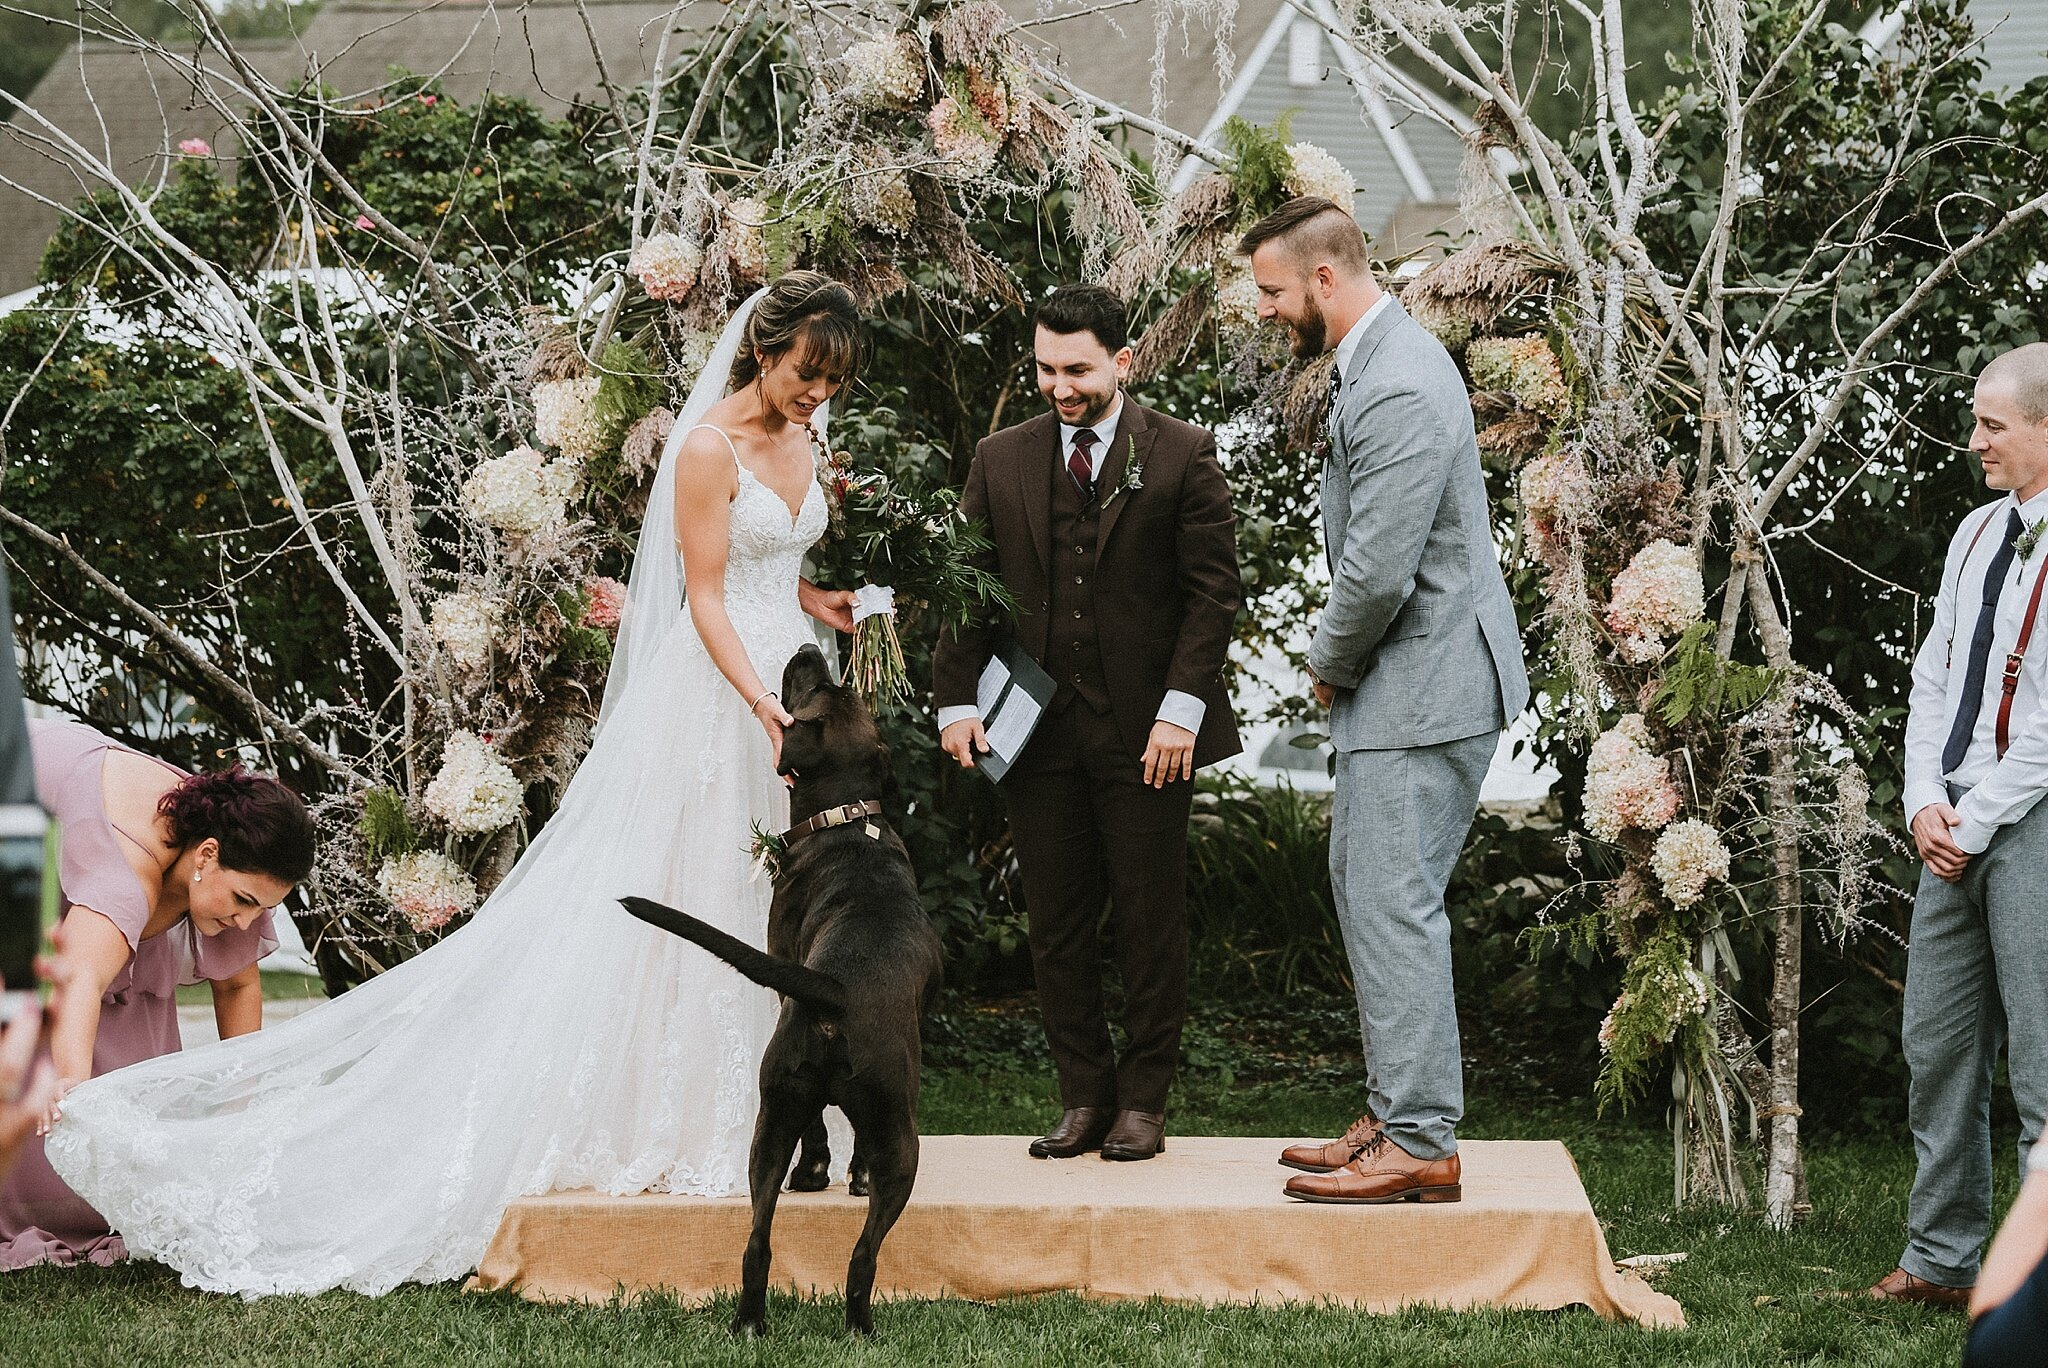 connecticut_wedding_3061.jpg